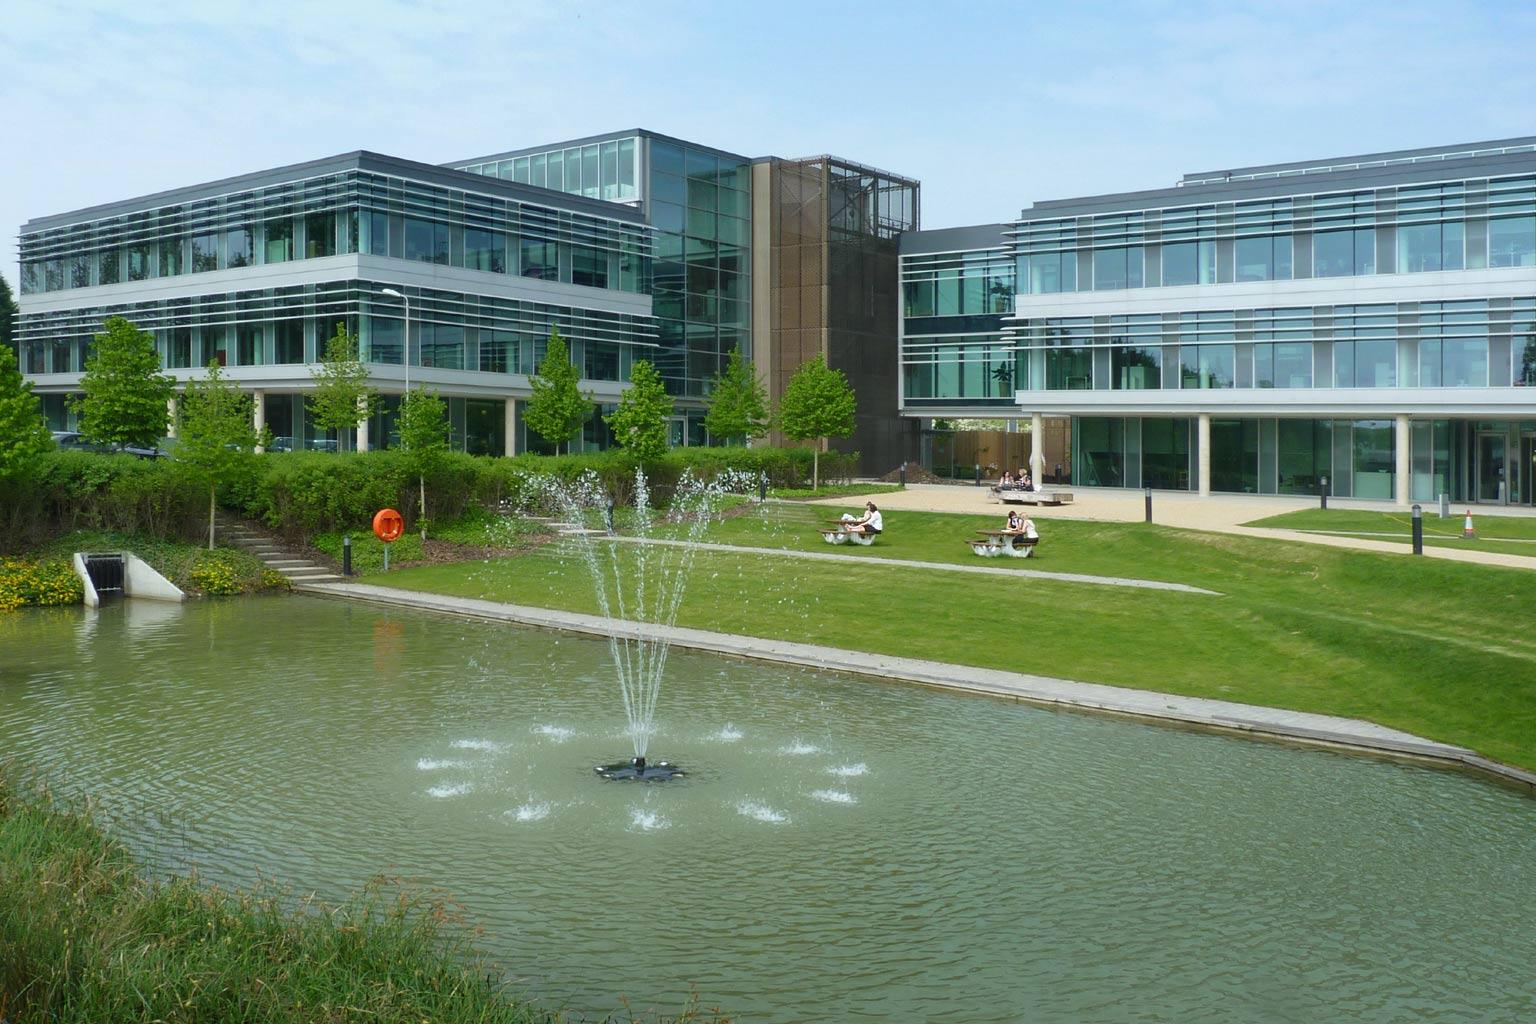 Cambridge_Science_Park_Napp_fountain